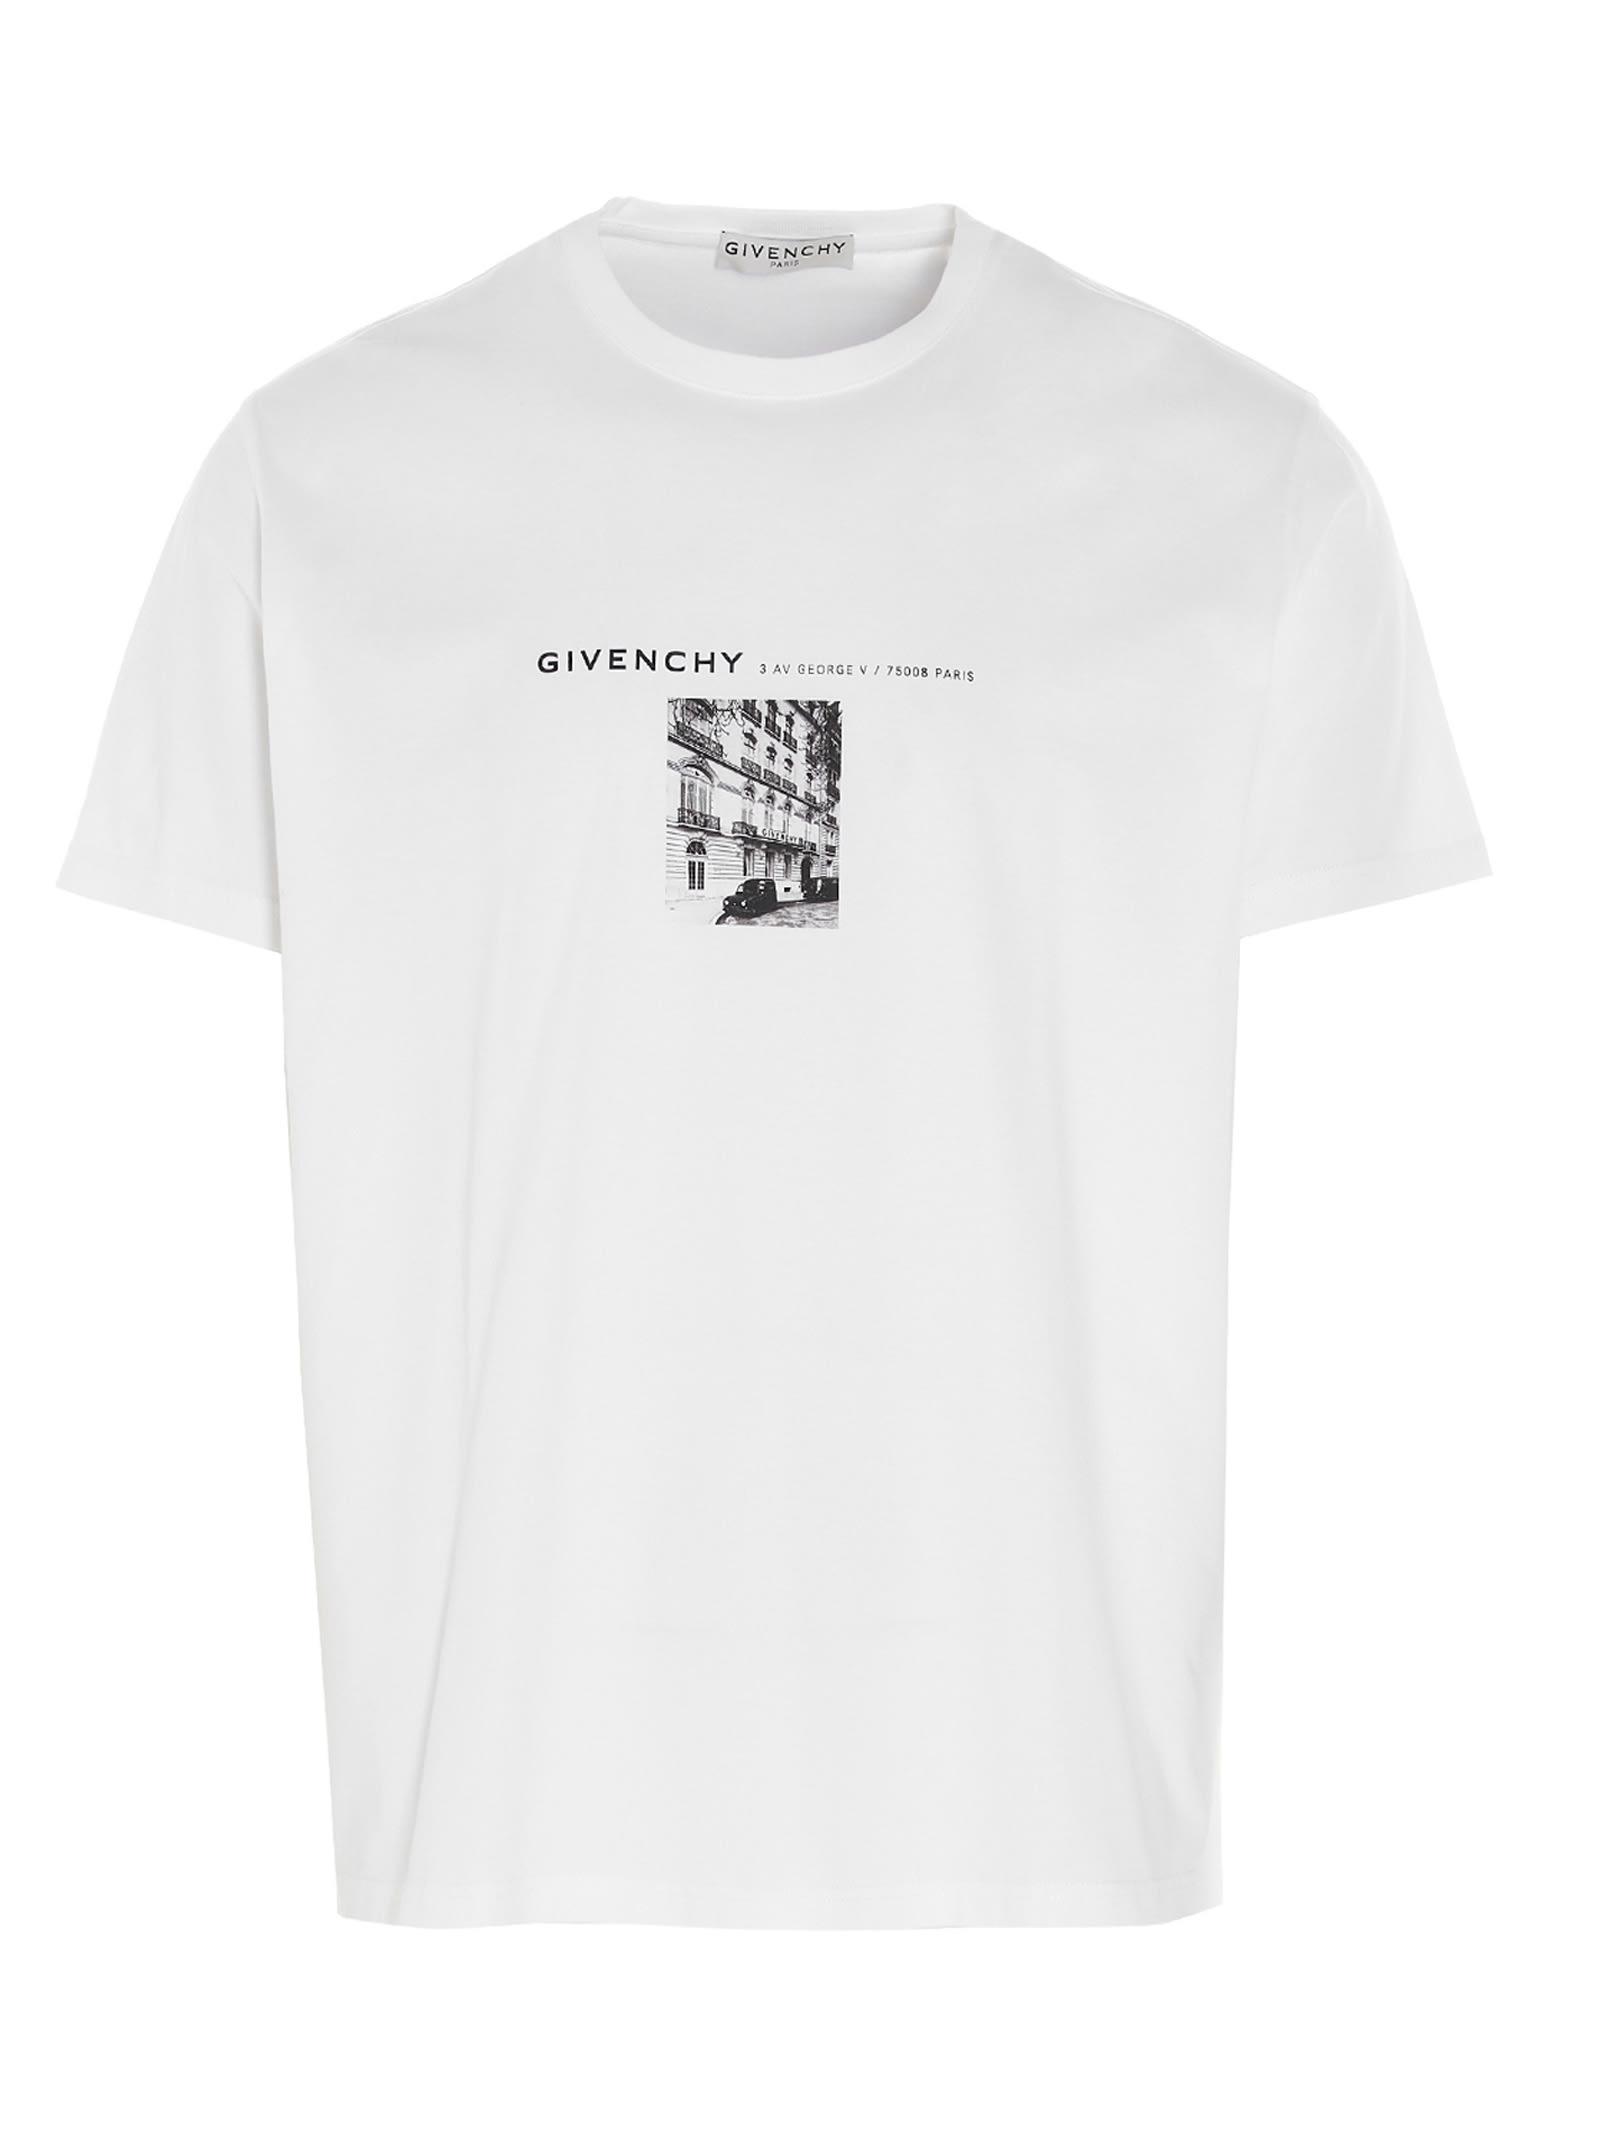 Givenchy ADRESS T-SHIRT